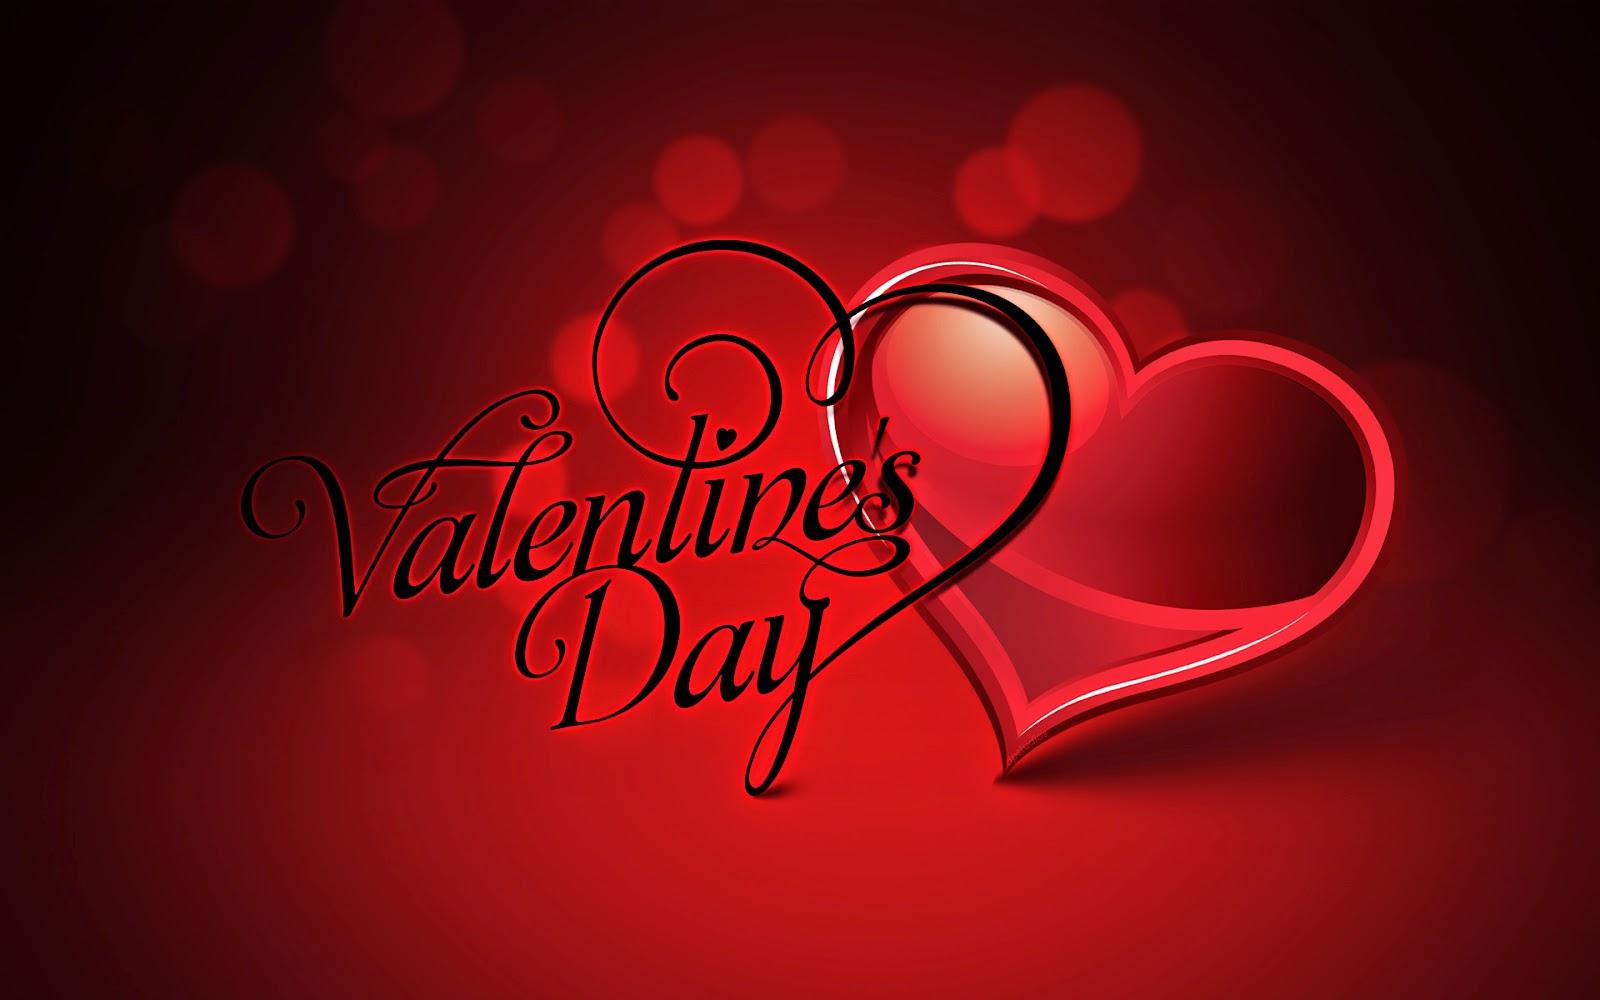 happy valentines day message wallpaper